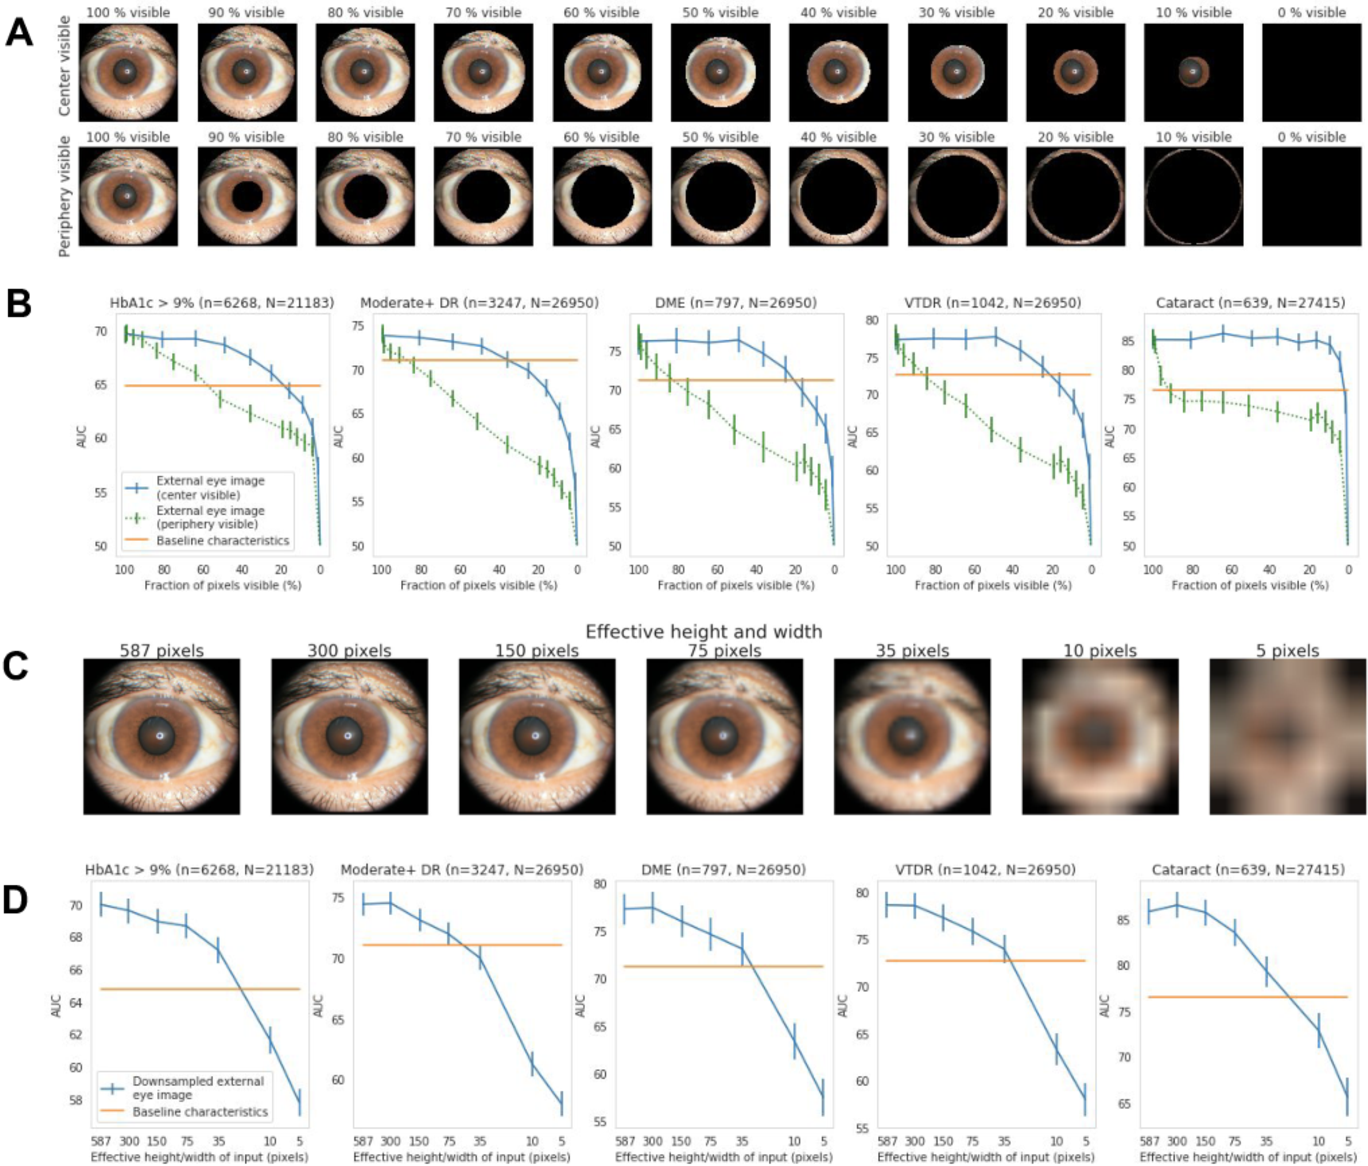 Figure 4 for Detecting hidden signs of diabetes in external eye photographs